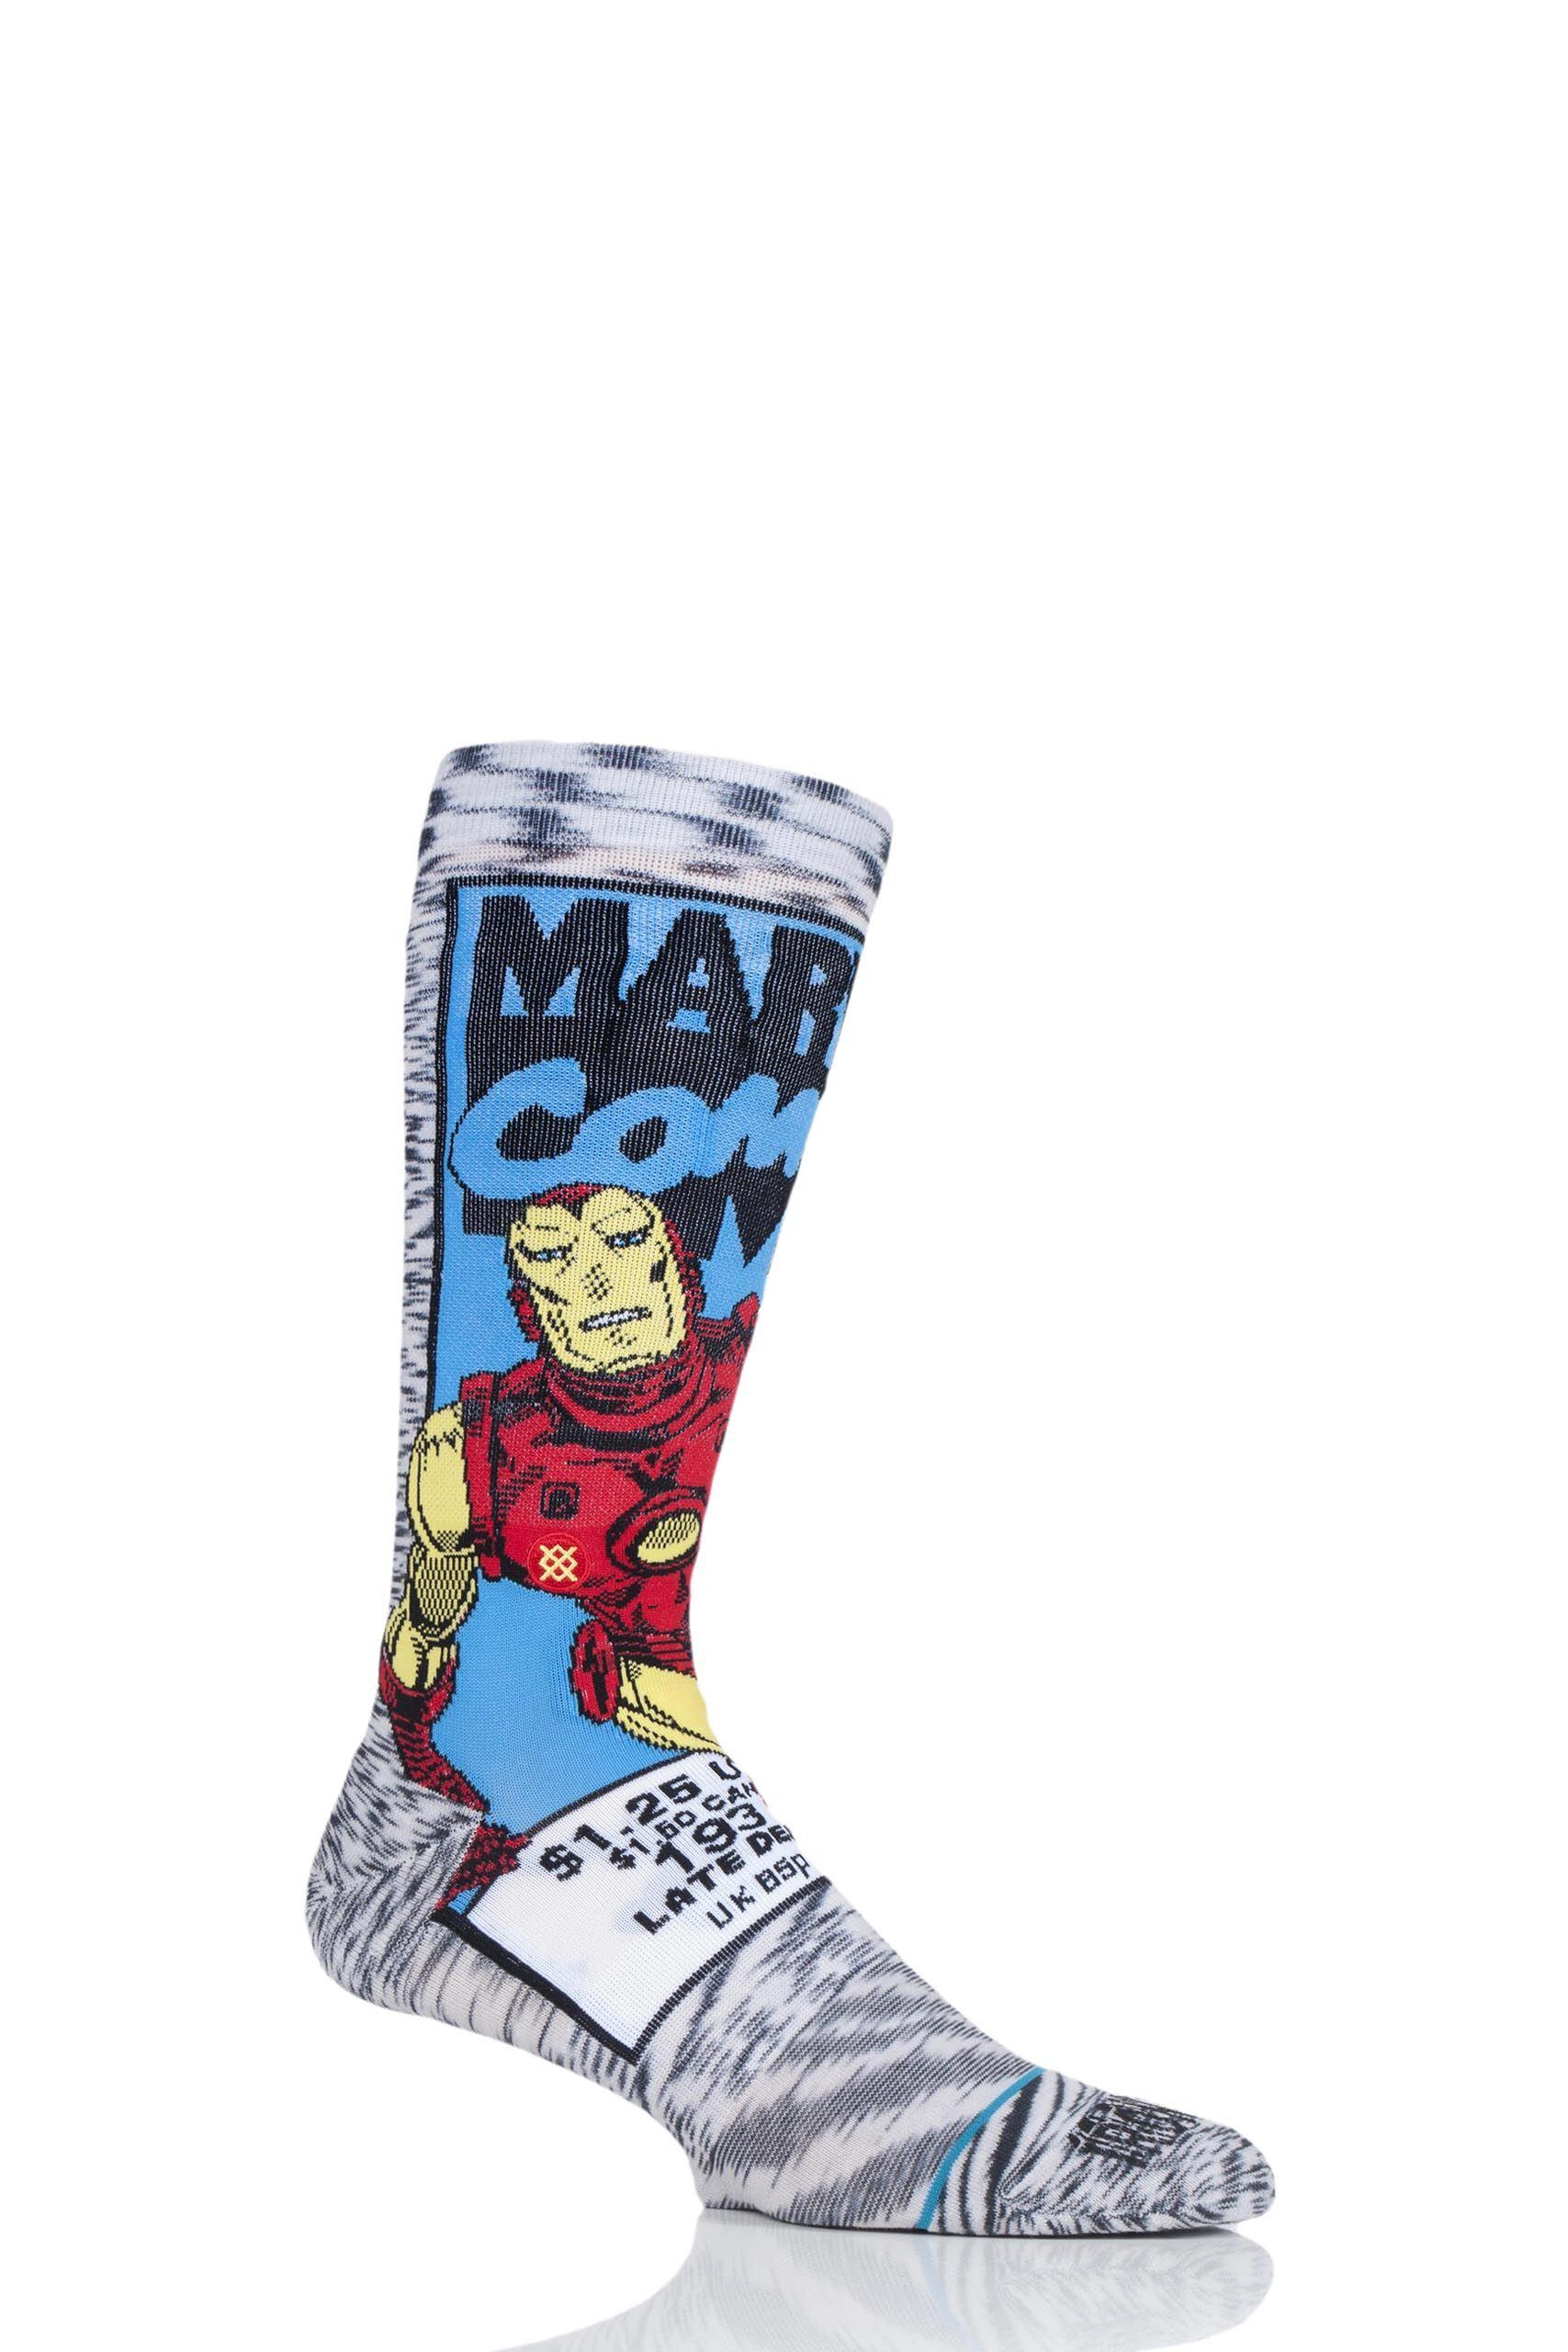 Image of 1 Pair Assorted Marvel Iron Man Comic Cotton Blend Socks Men's 8-11.5 Mens - Stance